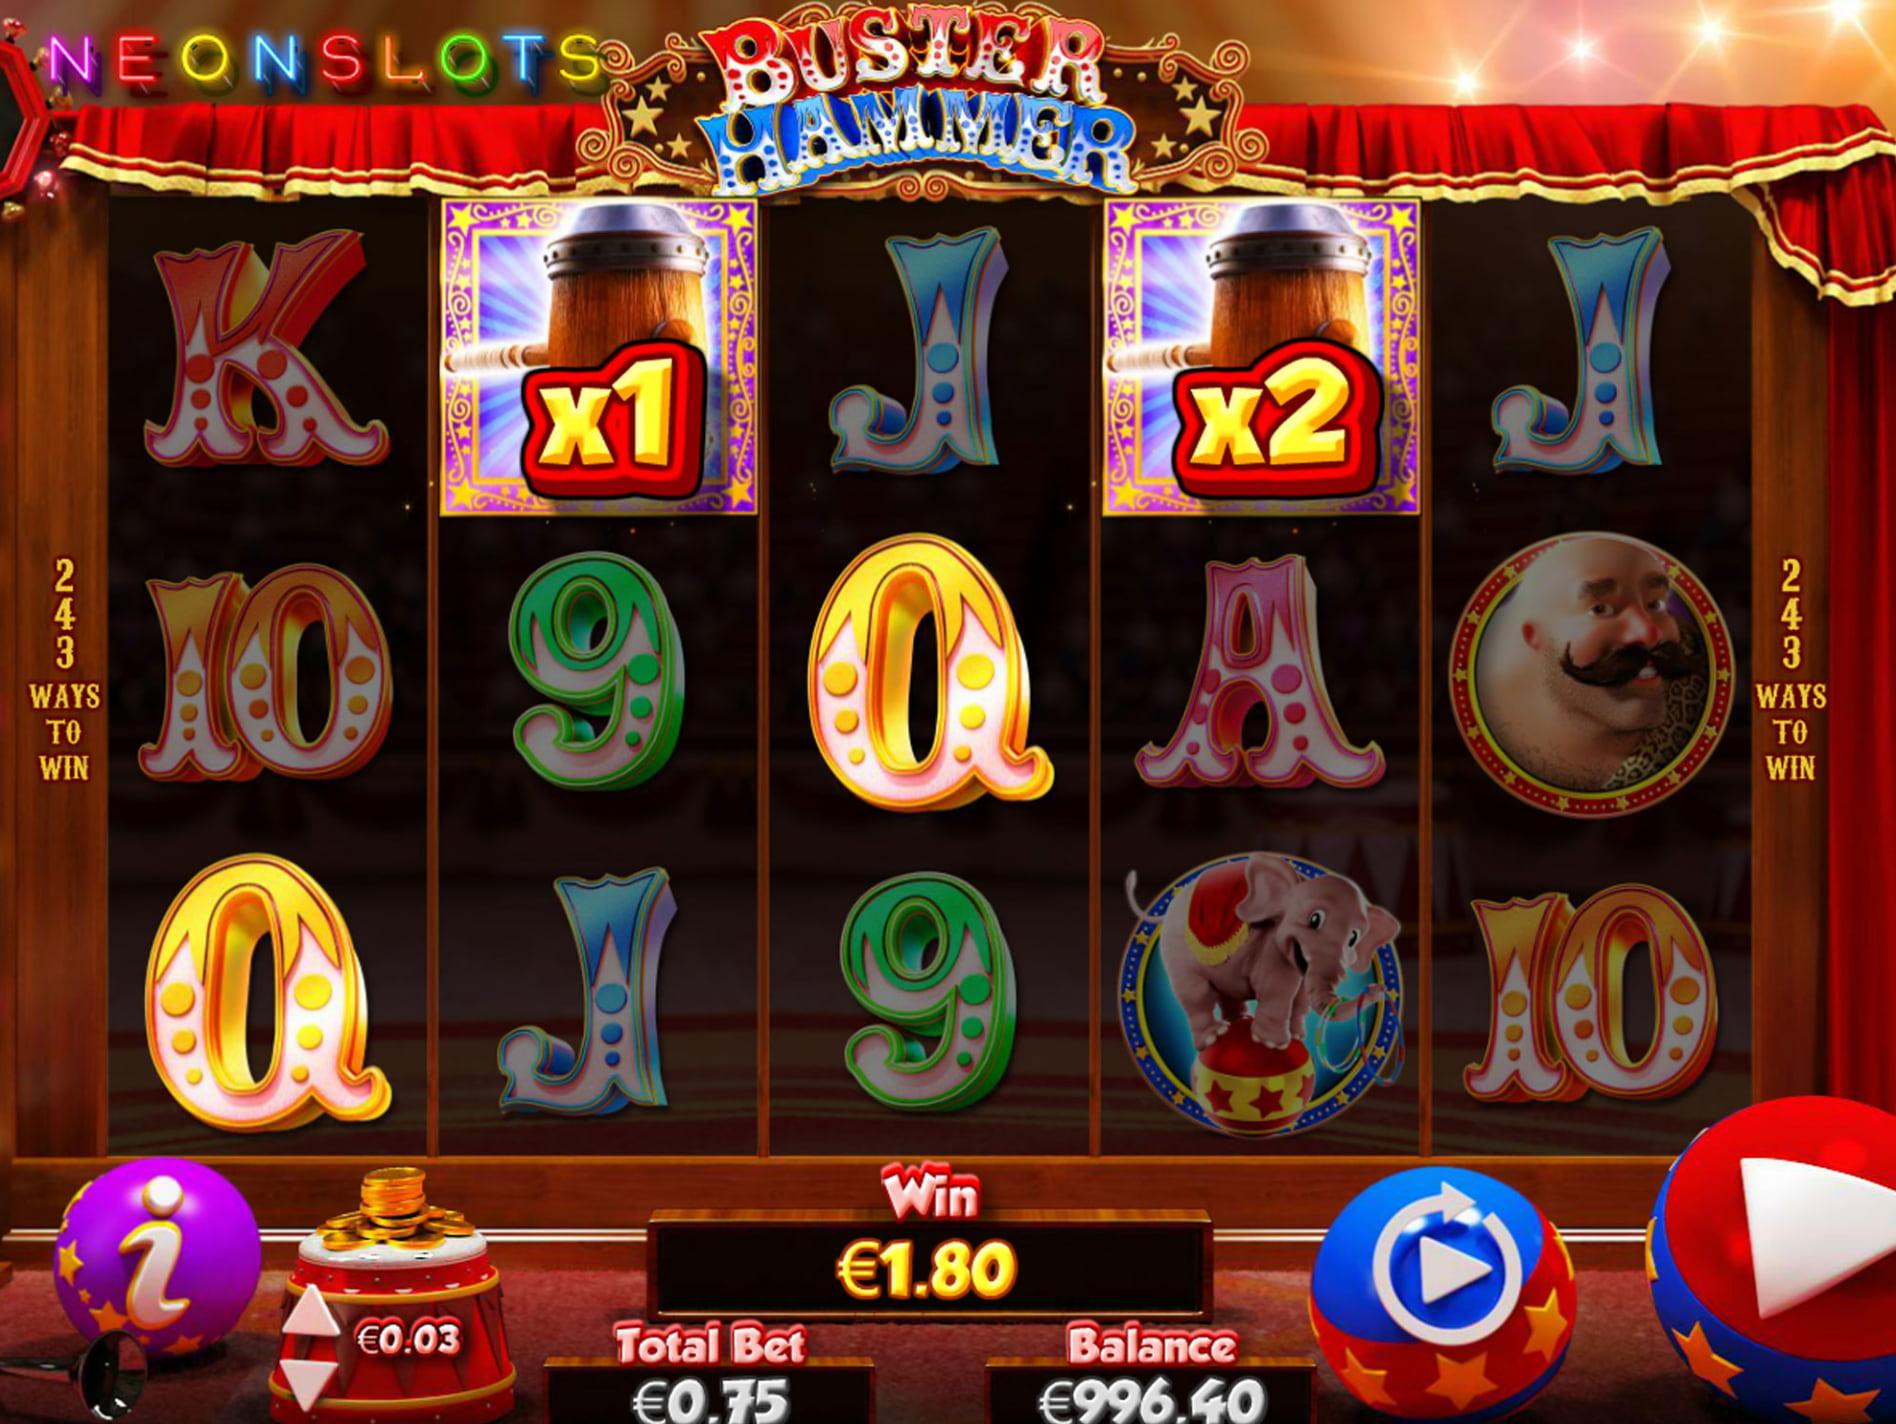 Bonos en el bingo tragamonedas con bonus 226774